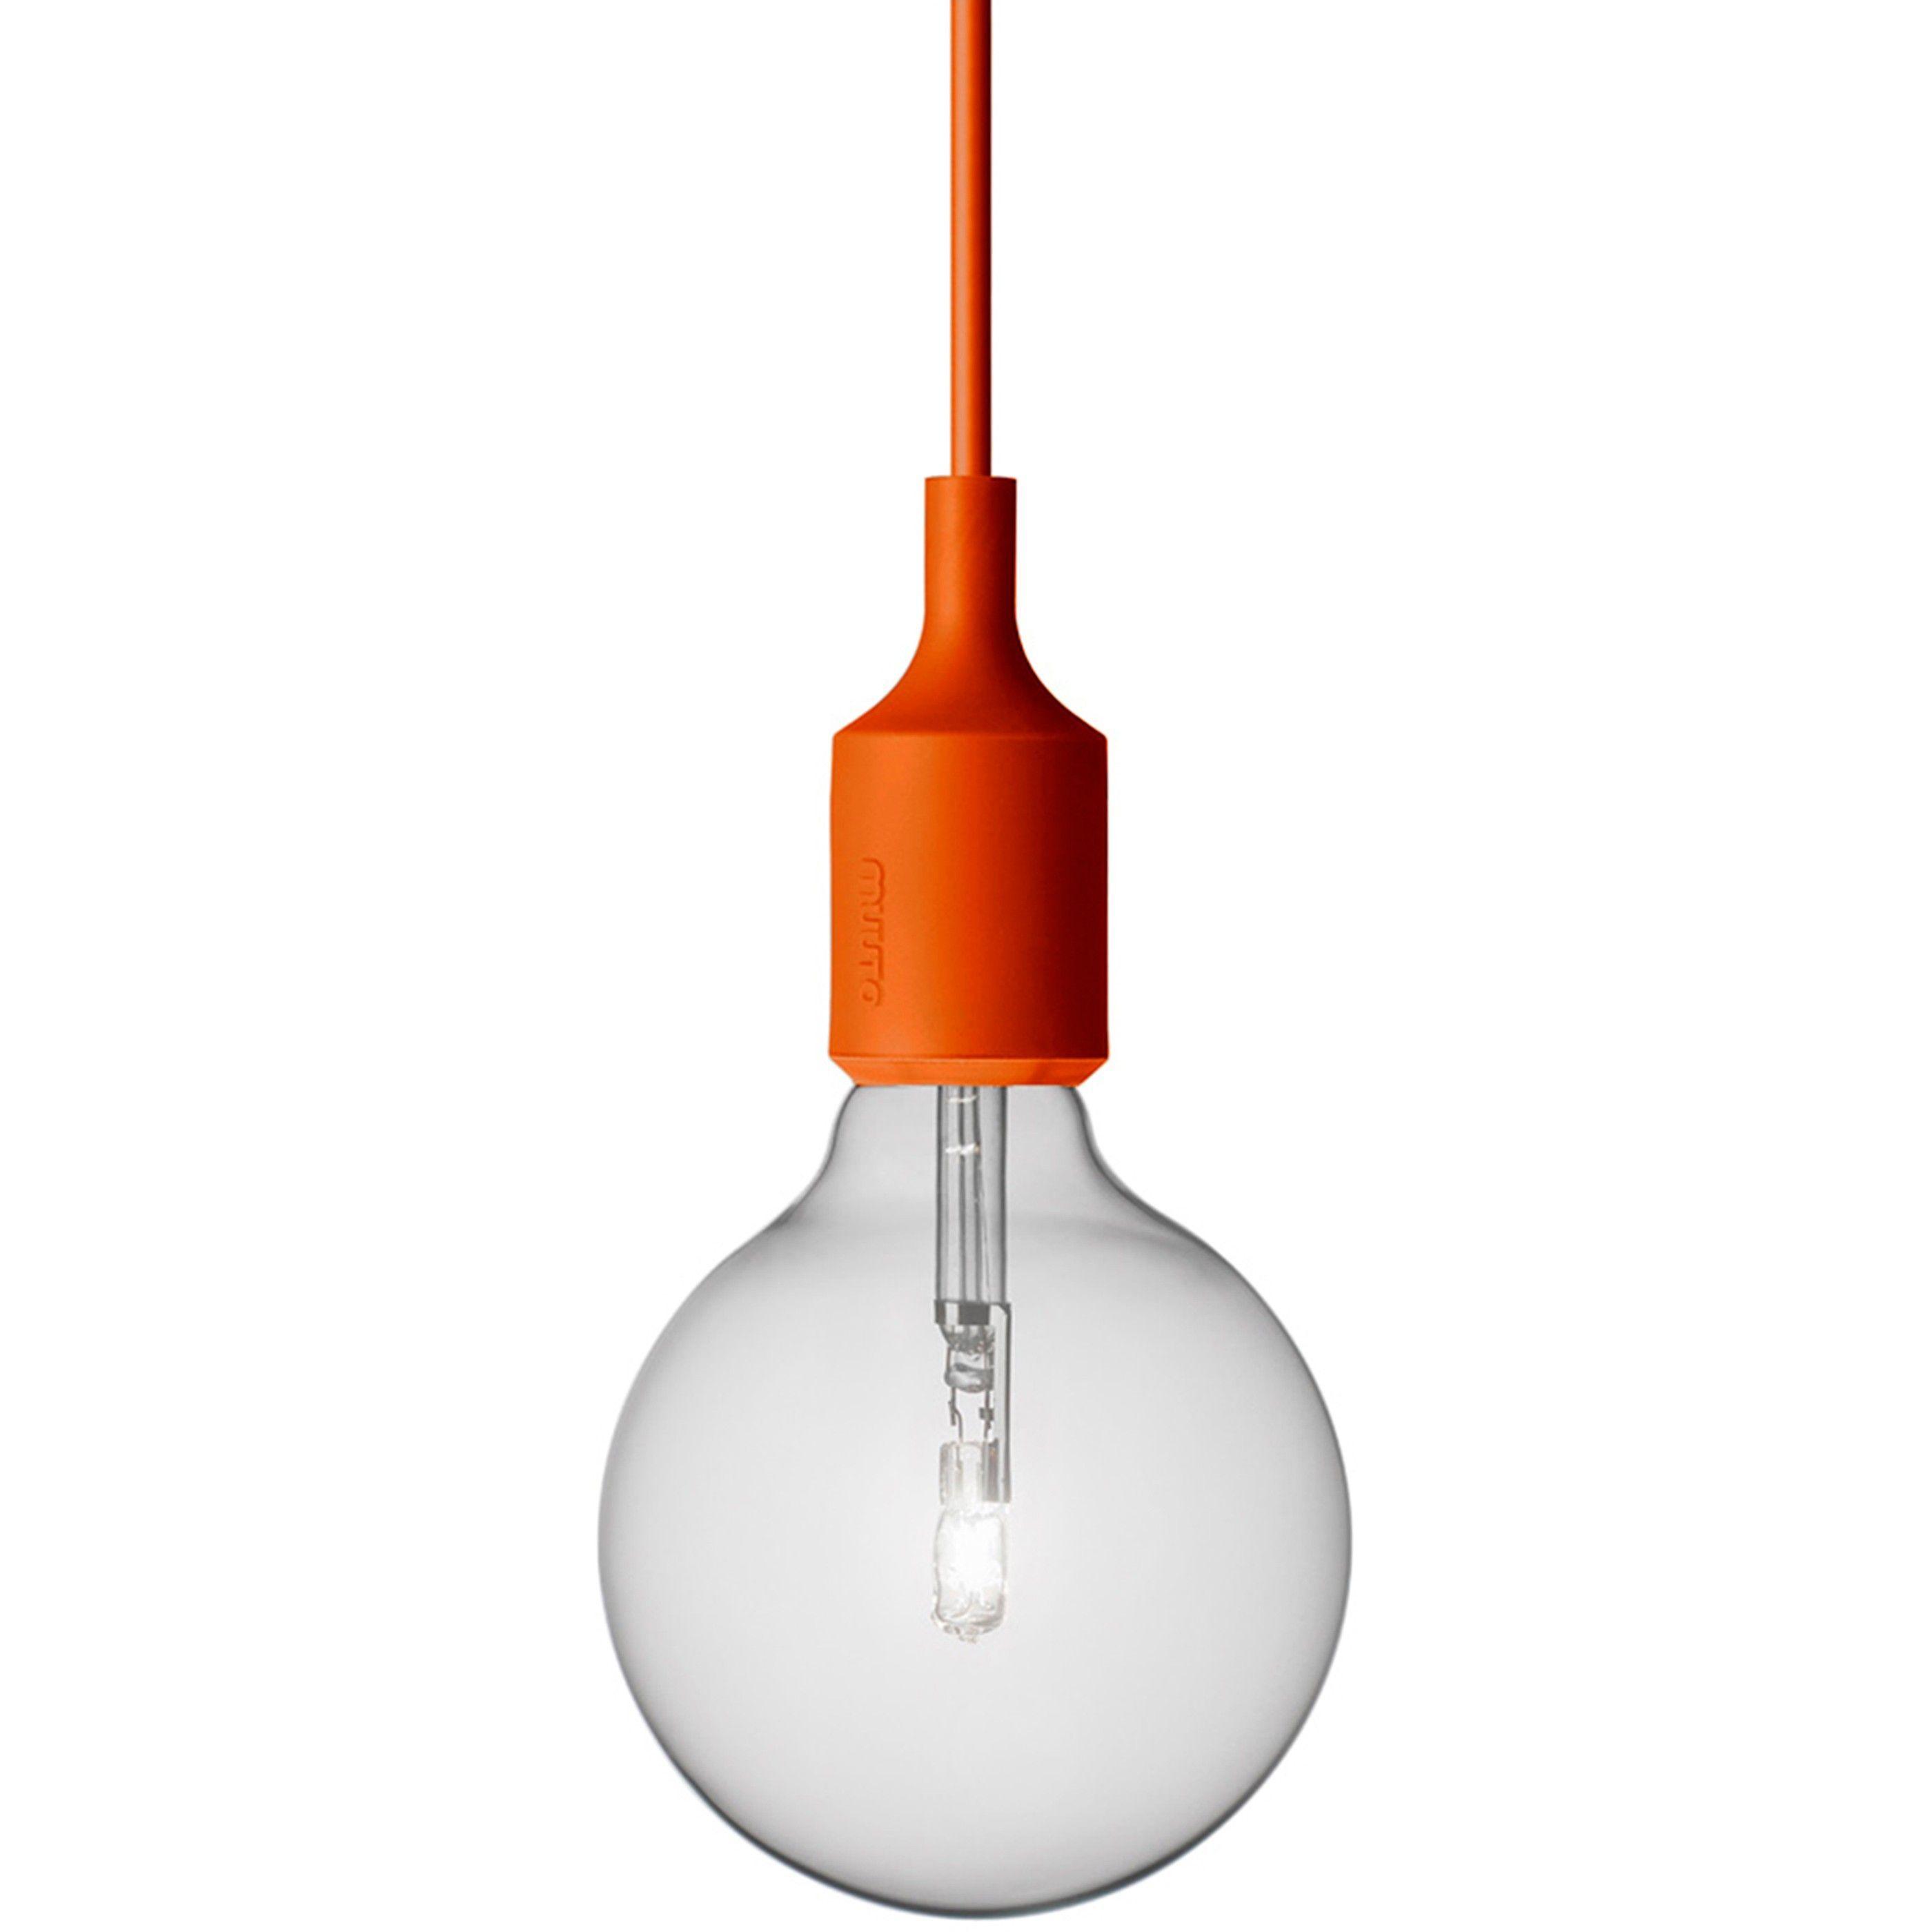 E27 hanglamp | Muuto | Zithoek | Pinterest | Doors and Interiors for Muuto E27 Orange  131fsj